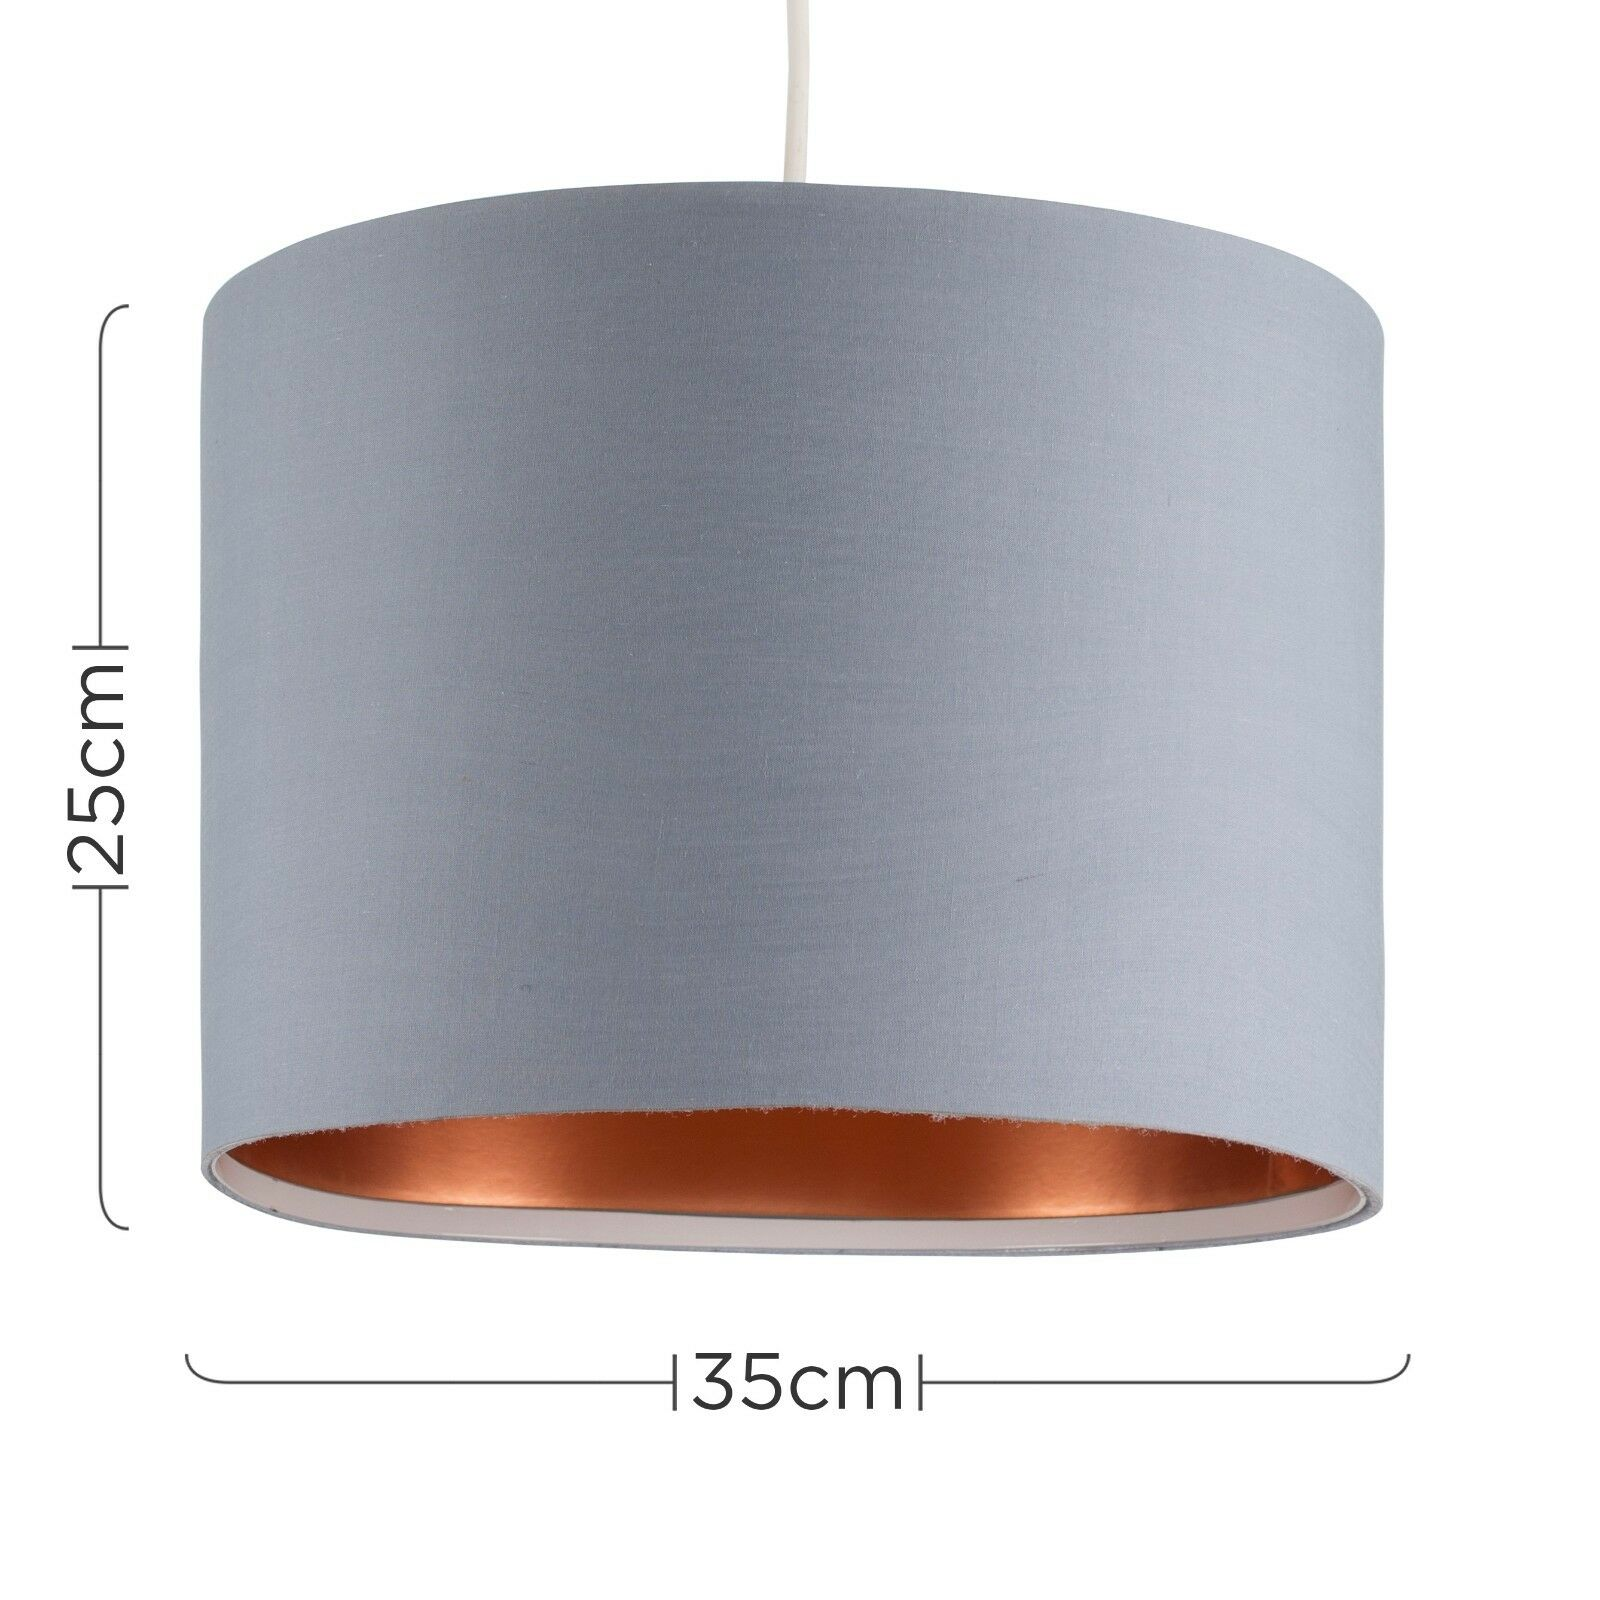 Tela-moderna-algodon-facil-ajuste-Techo-Colgante-Pantalla-De-Mesa-tonos-de-luz-de-tambor miniatura 134